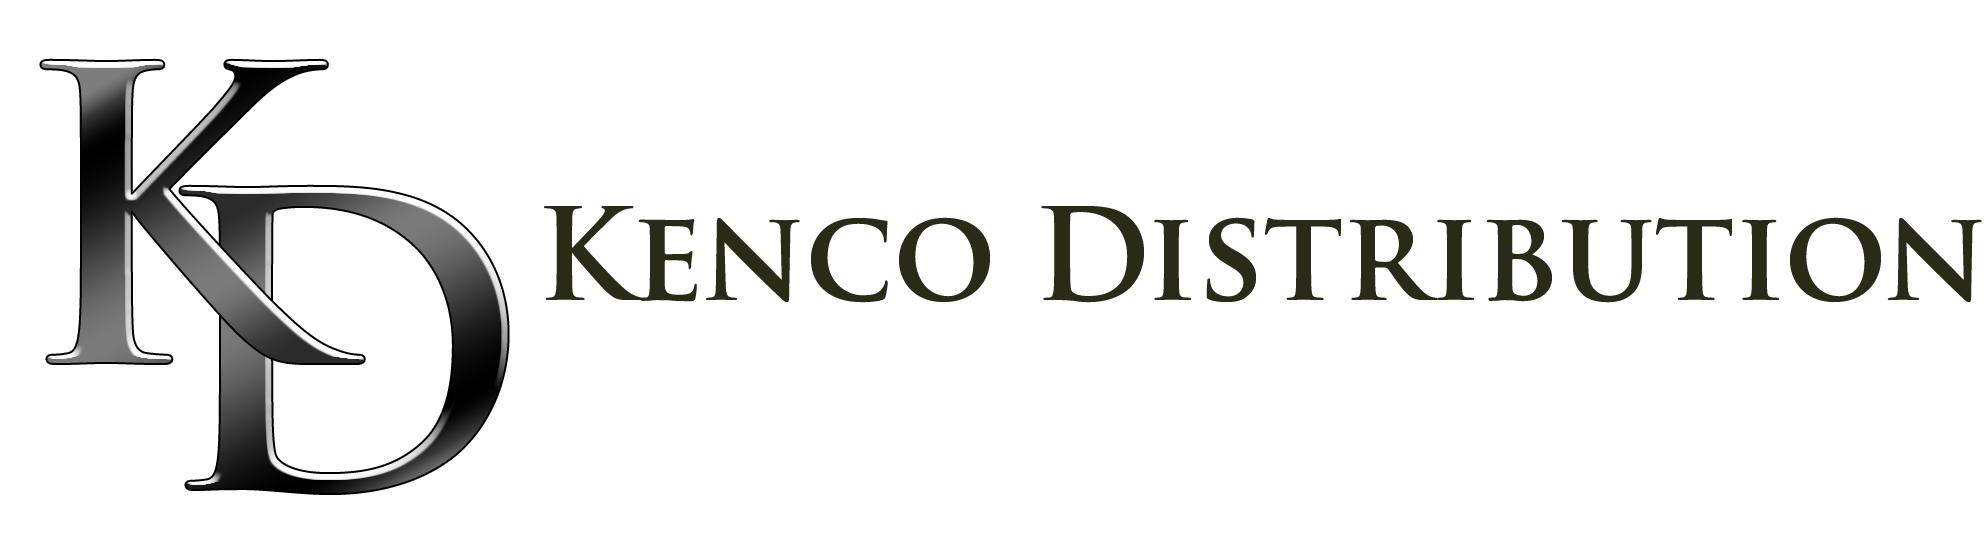 Welcome to Kenco Distribution, Inc